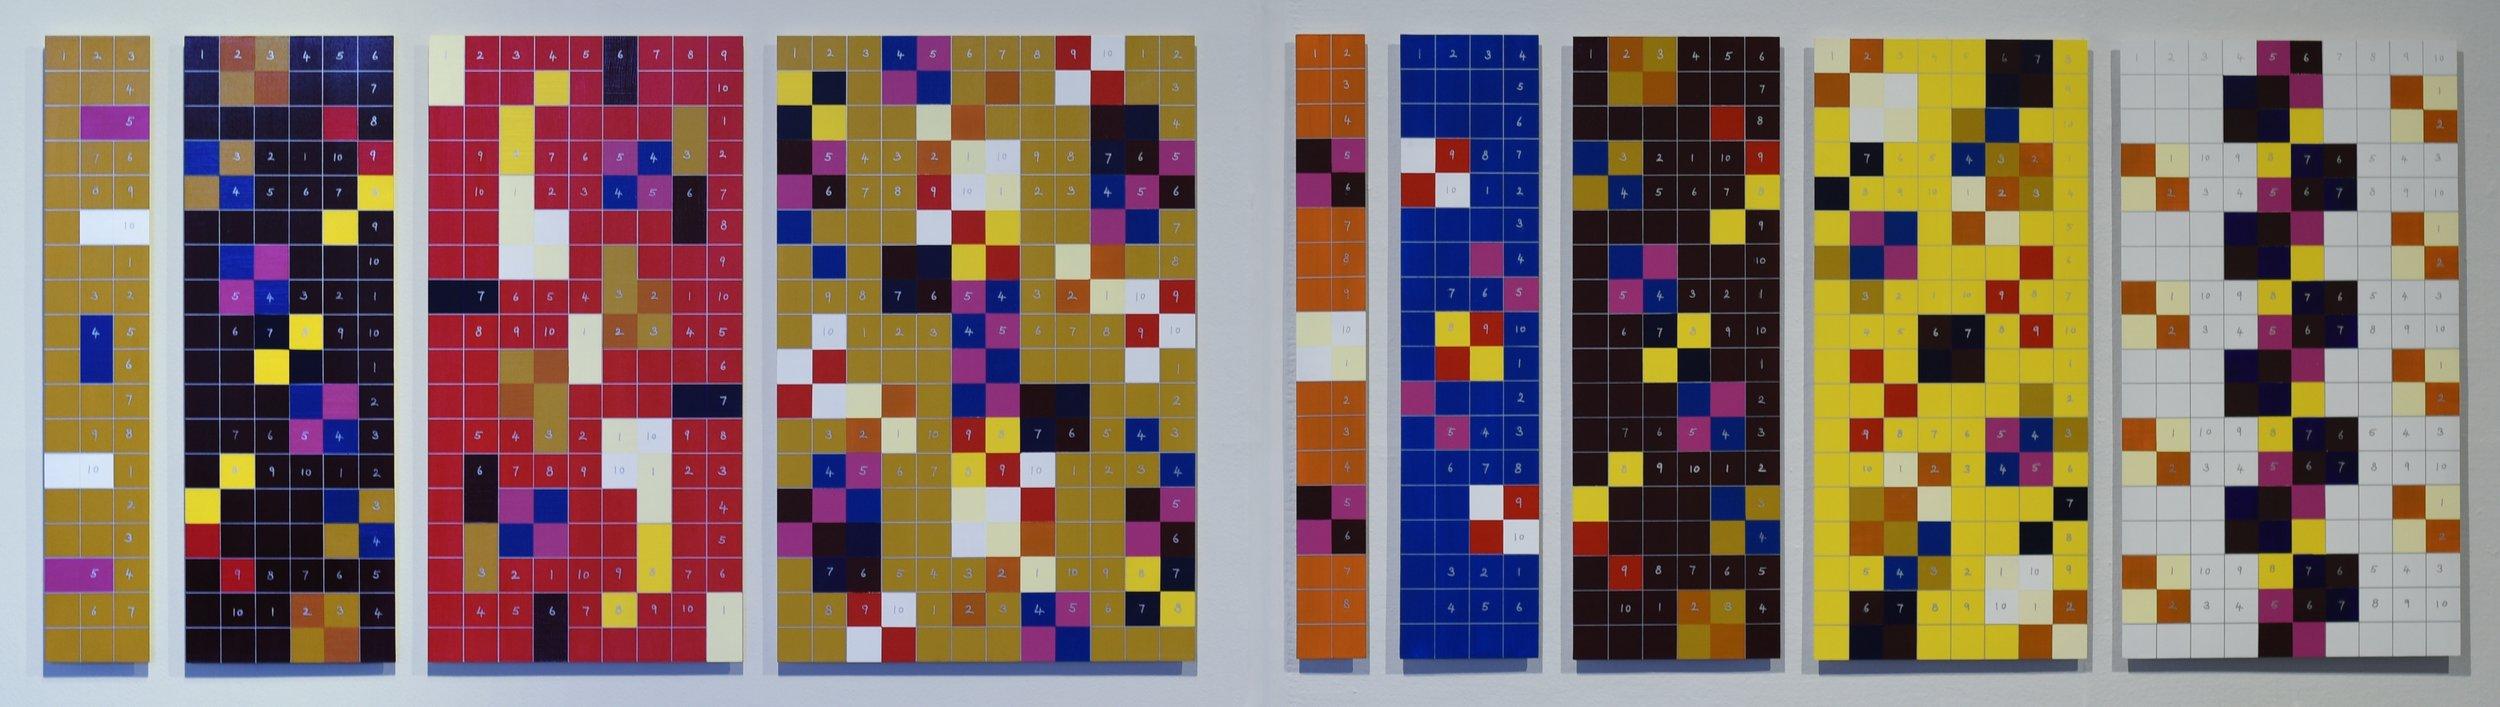 Horizontal interlocking load  A group of four panels  18 x 3, 18 x 6, 18 x 9, 18 x 12  Odd series  A group of five panels  18 x 2, 18 x 4, 18 x 6, 18 x 8, 18 x 10  Even series  2016  Acrylic on panel